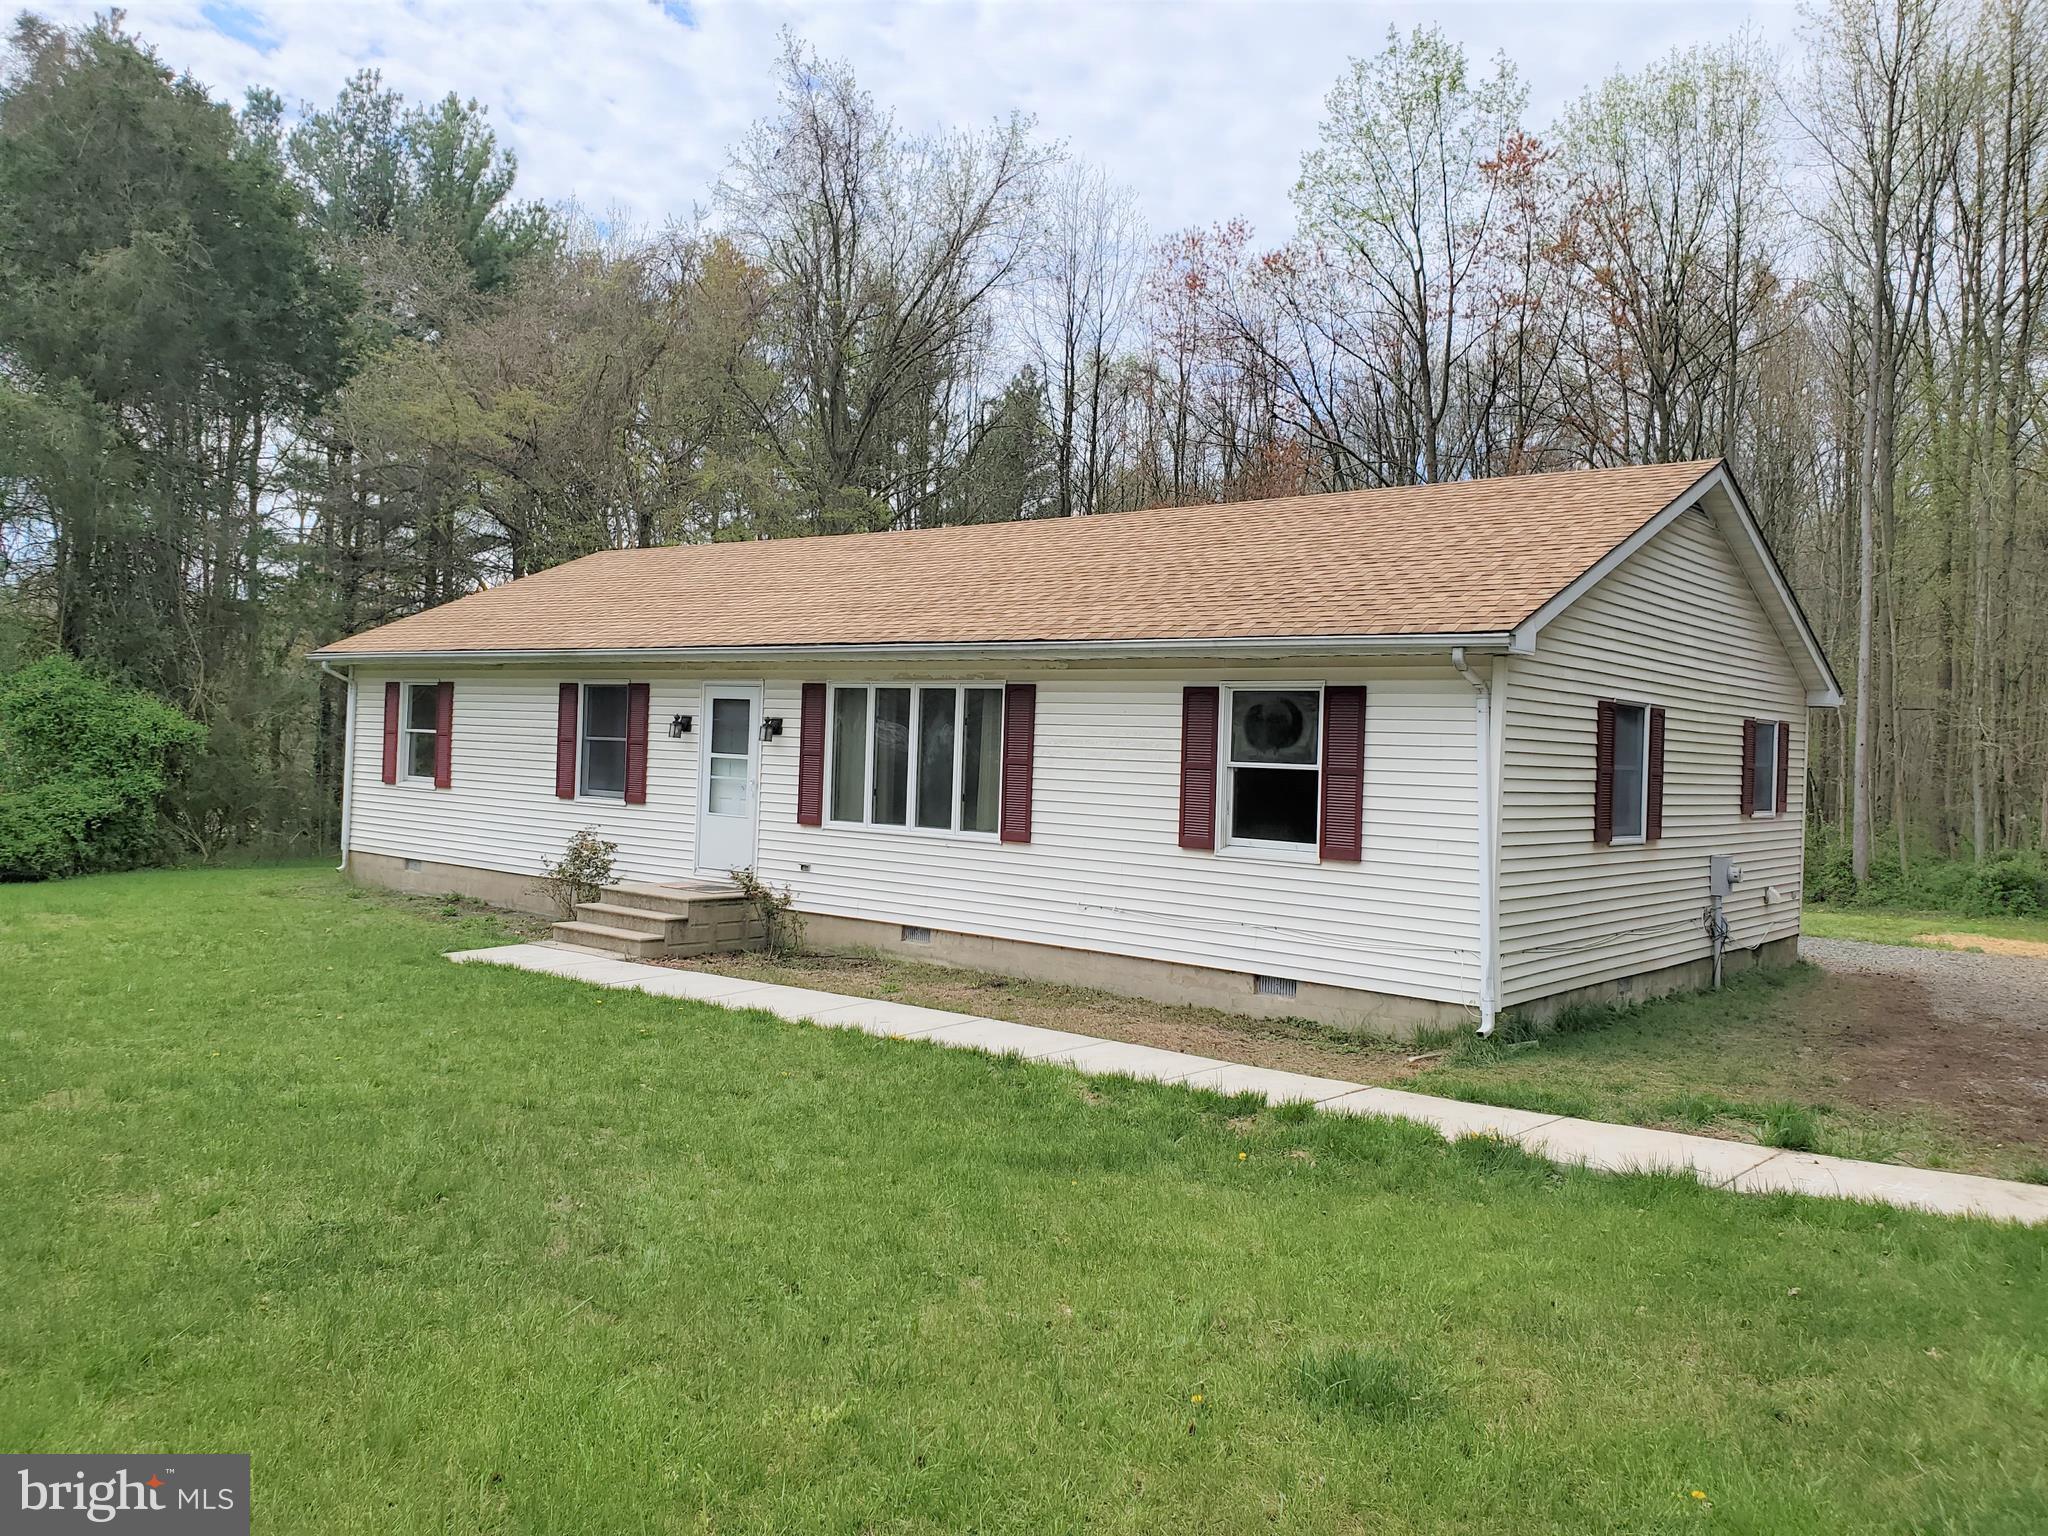 161 Deaver Rd, Elkton, MD, 21921